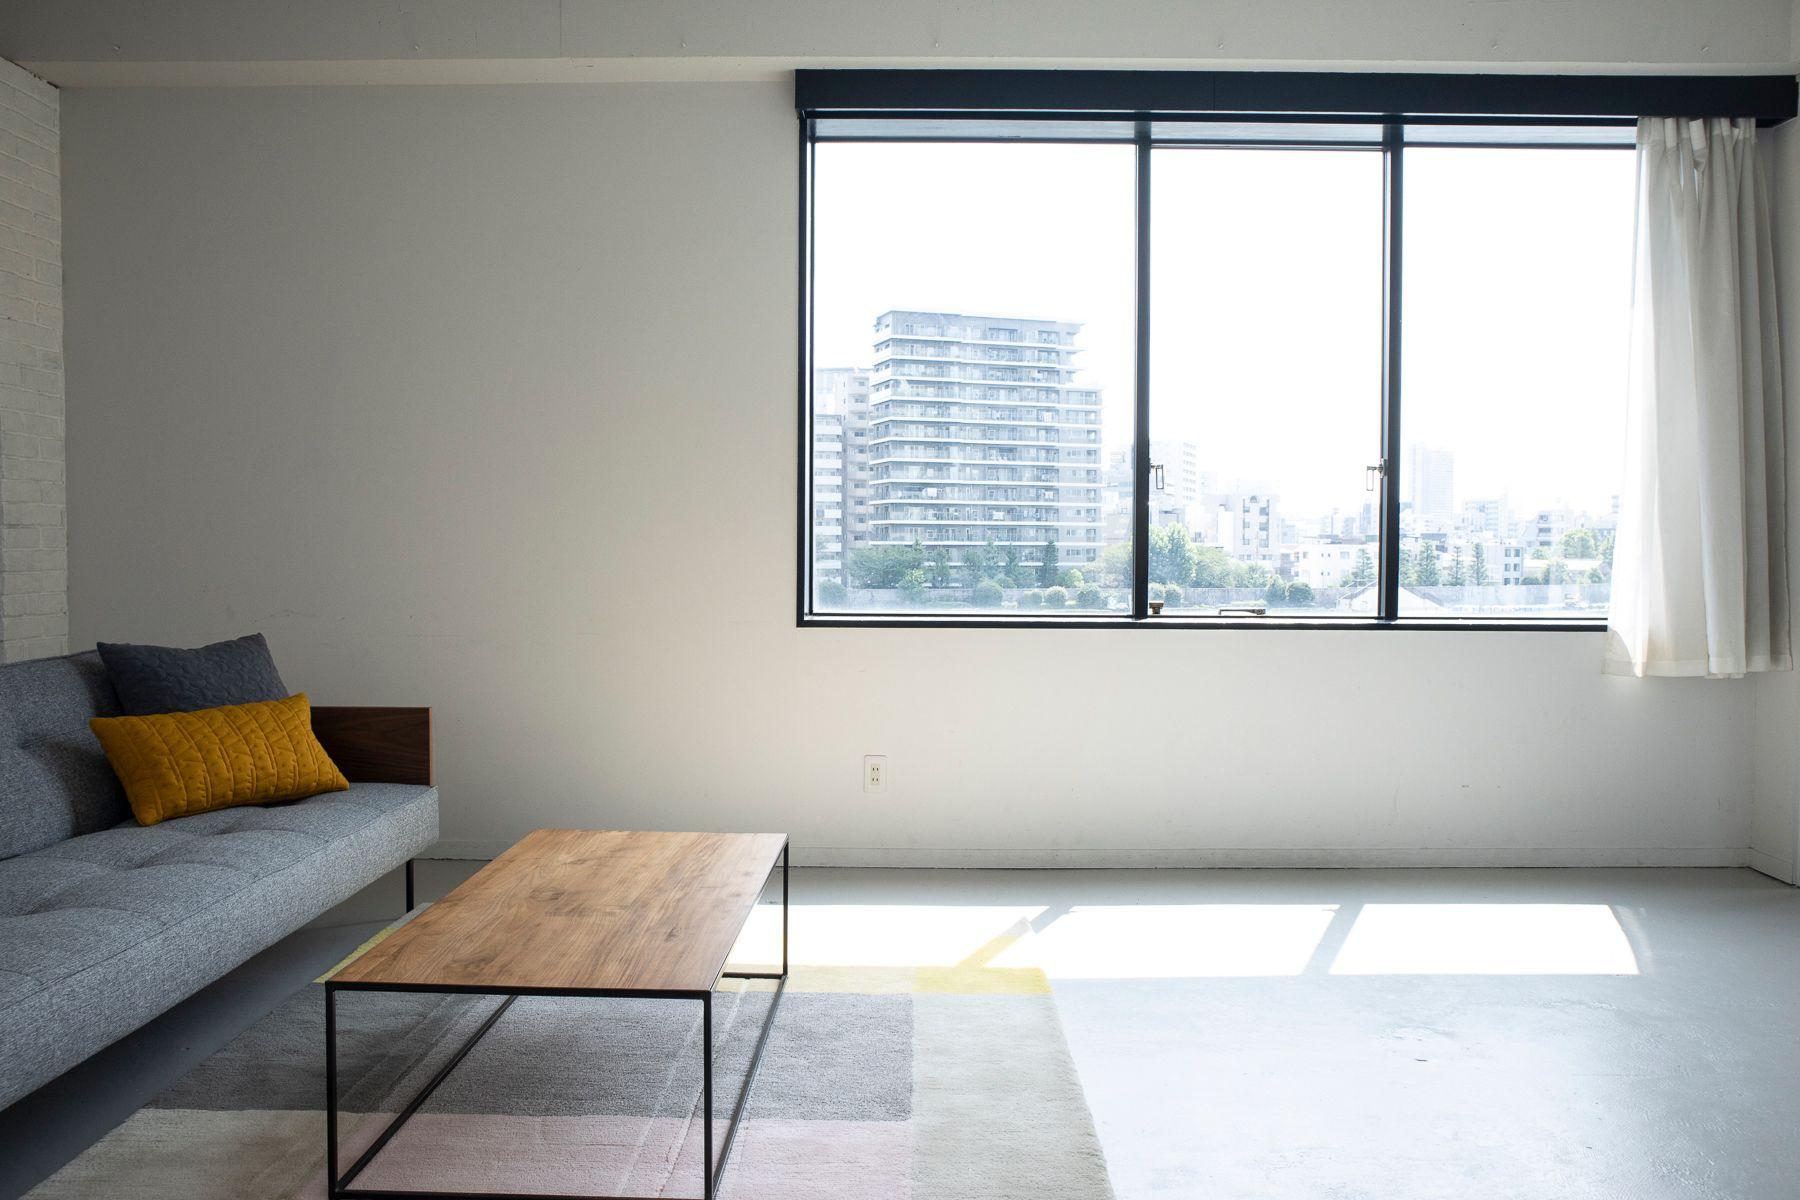 STUDIO FLOD(スタジオフロード)3、4F4F/BLACK 西側に大きな斜め窓